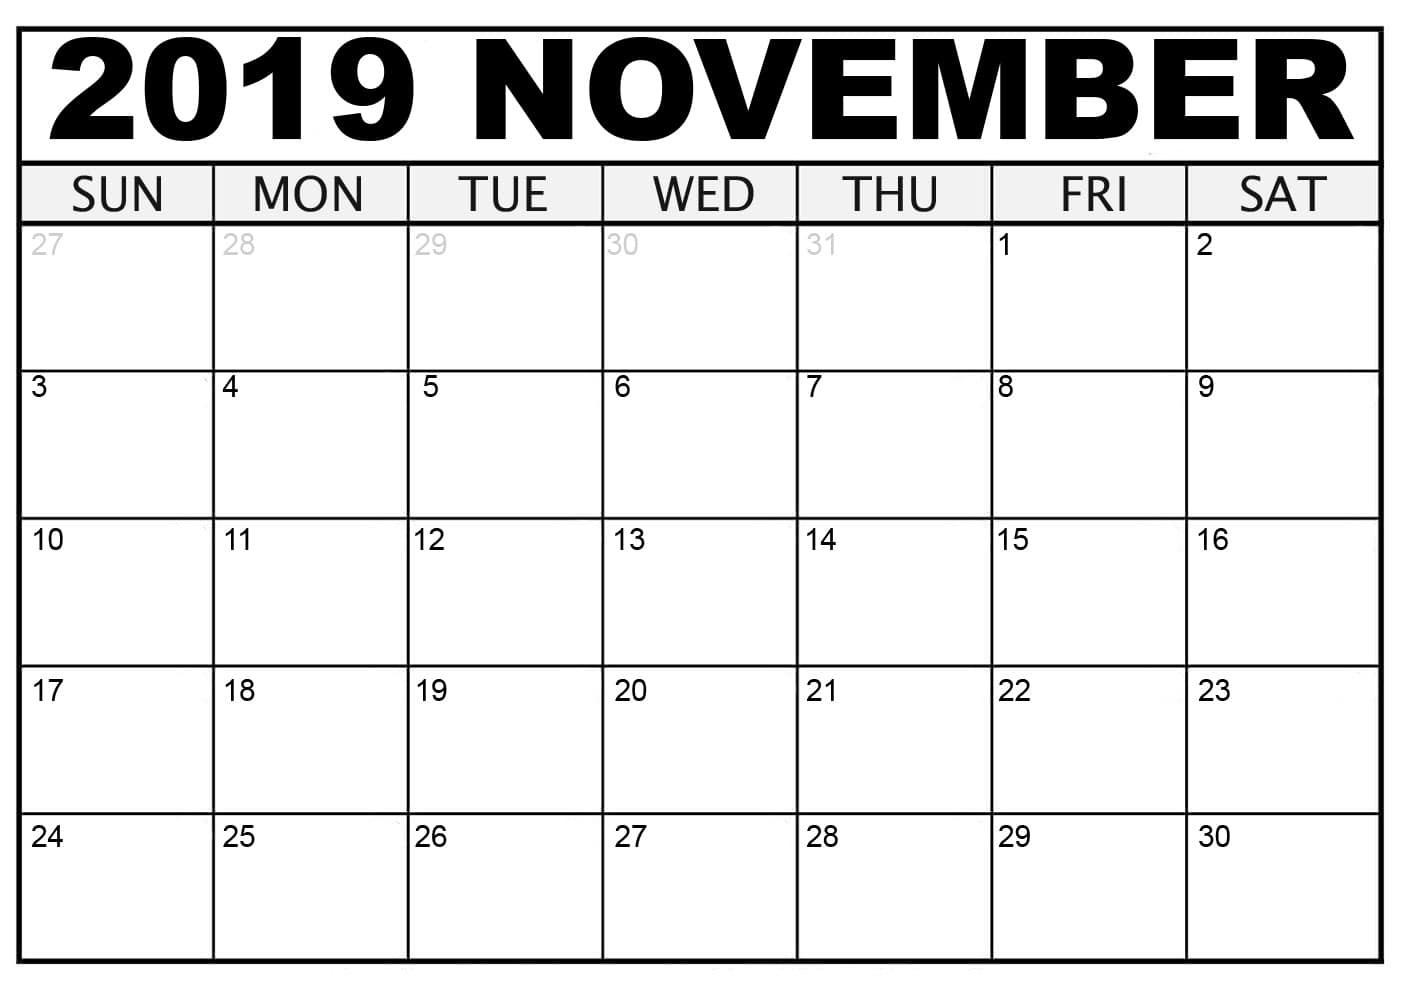 November 2019 Printable Calendar - Free Blank Templates